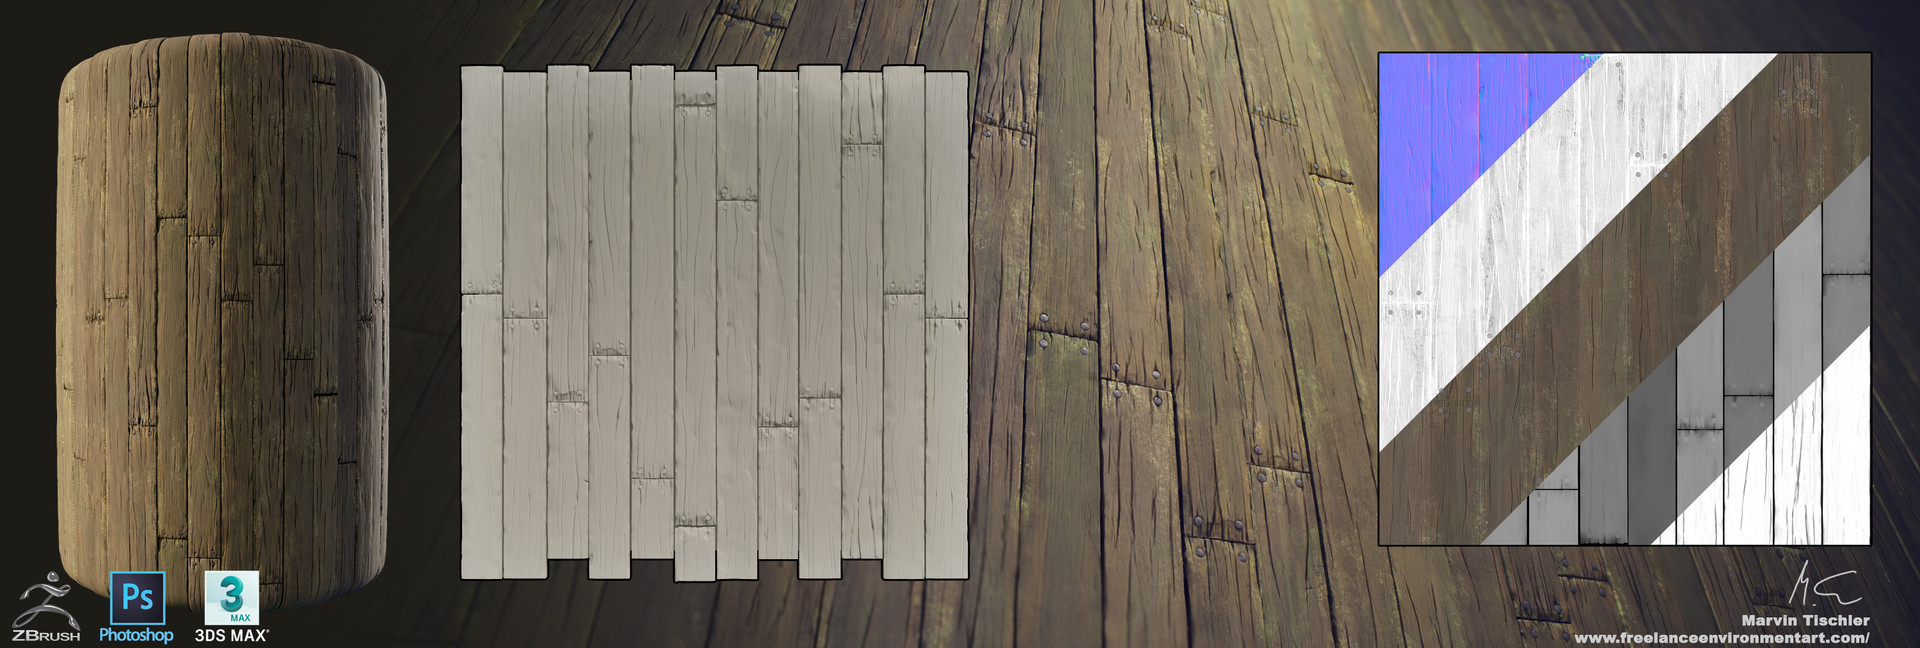 Marvin tischler textures 002 i